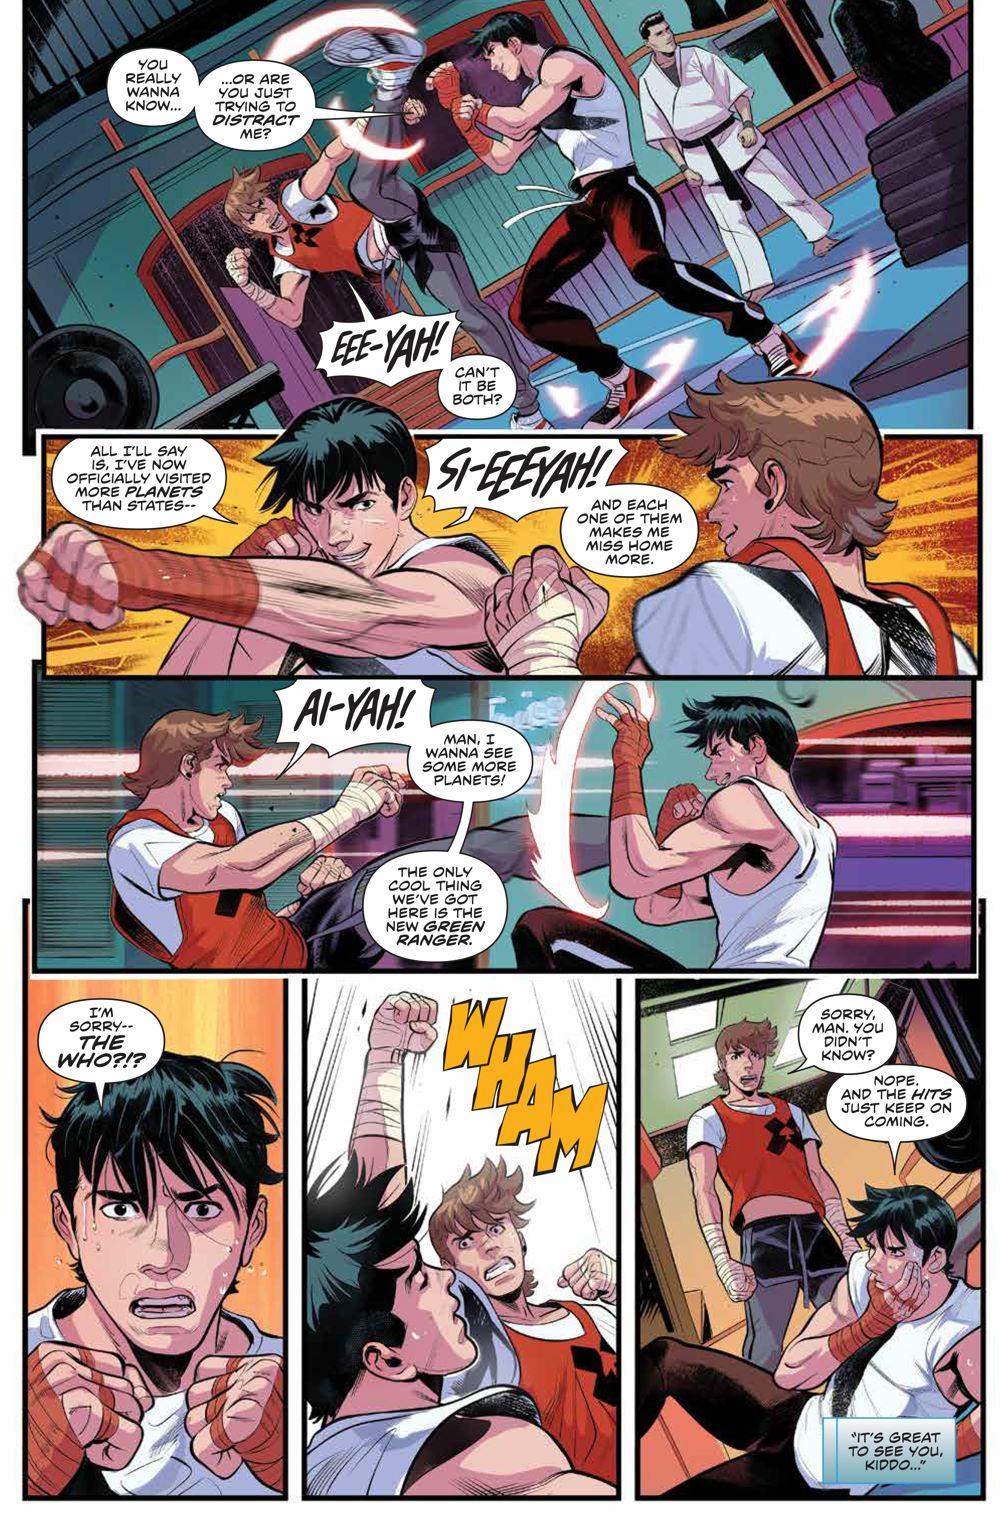 PowerRangers_v1_SC_PRESS_19 ComicList Previews: POWER RANGERS VOLUME 1 TP